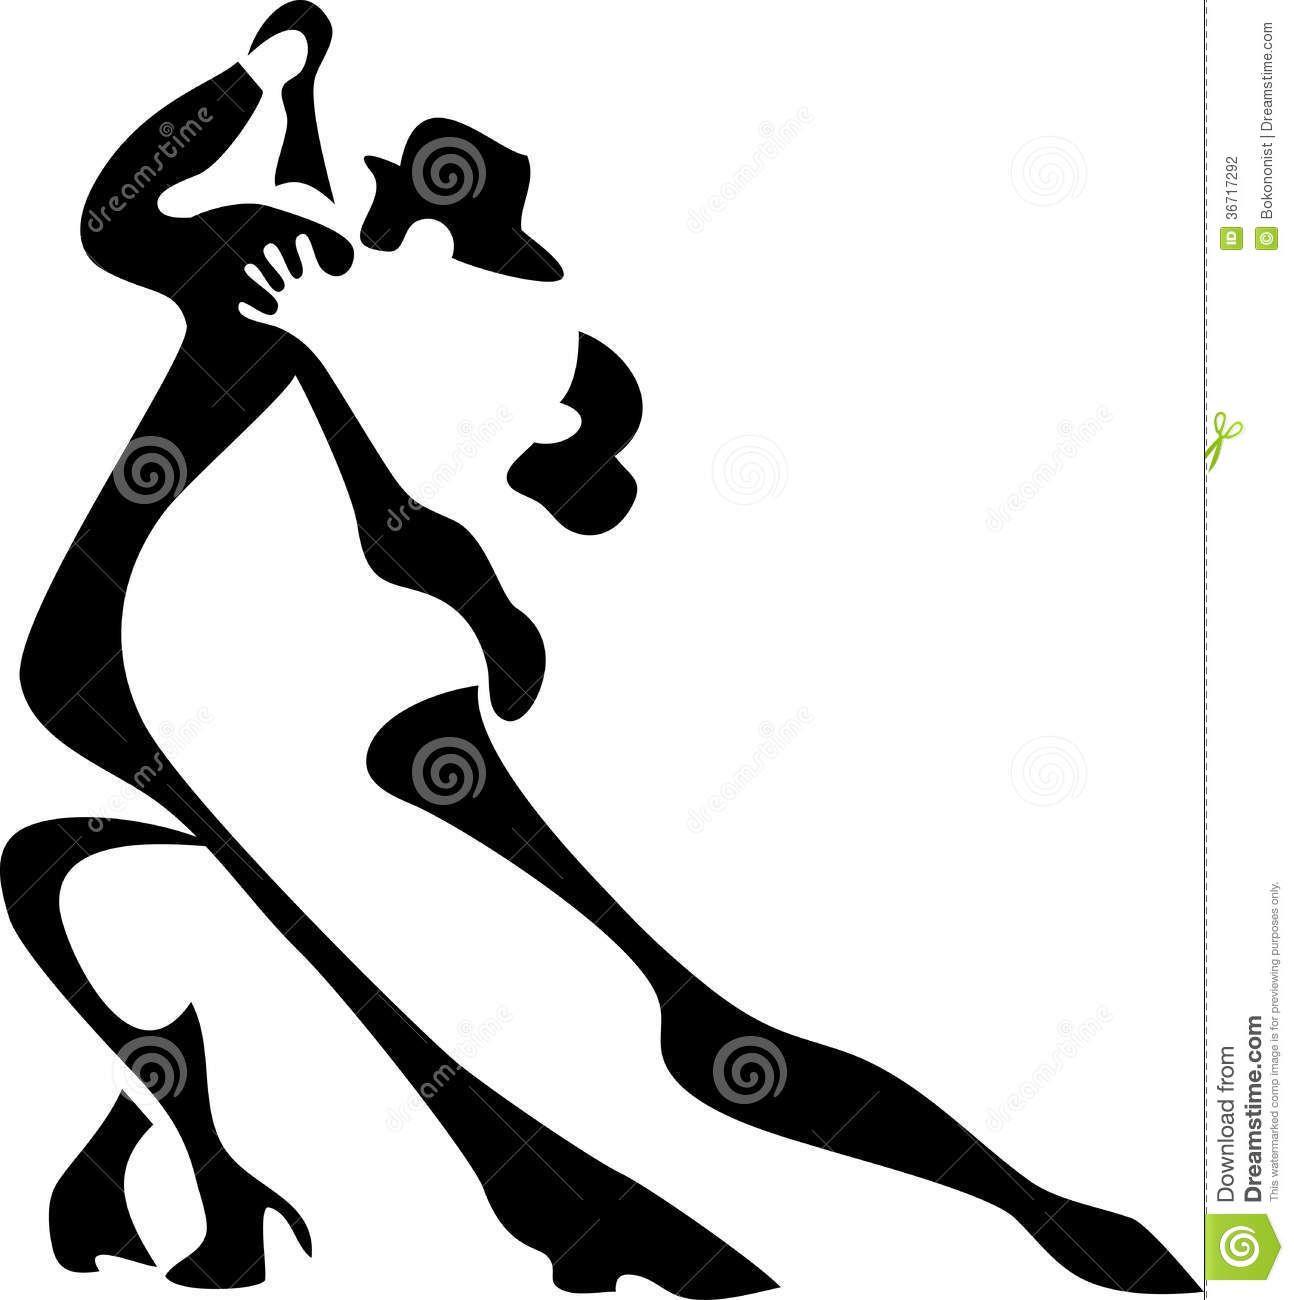 Kuva sivustosta http://thumbs.dreamstime.com/z/tango-dancers-stylized-black-white-illustration-36717292.jpg.